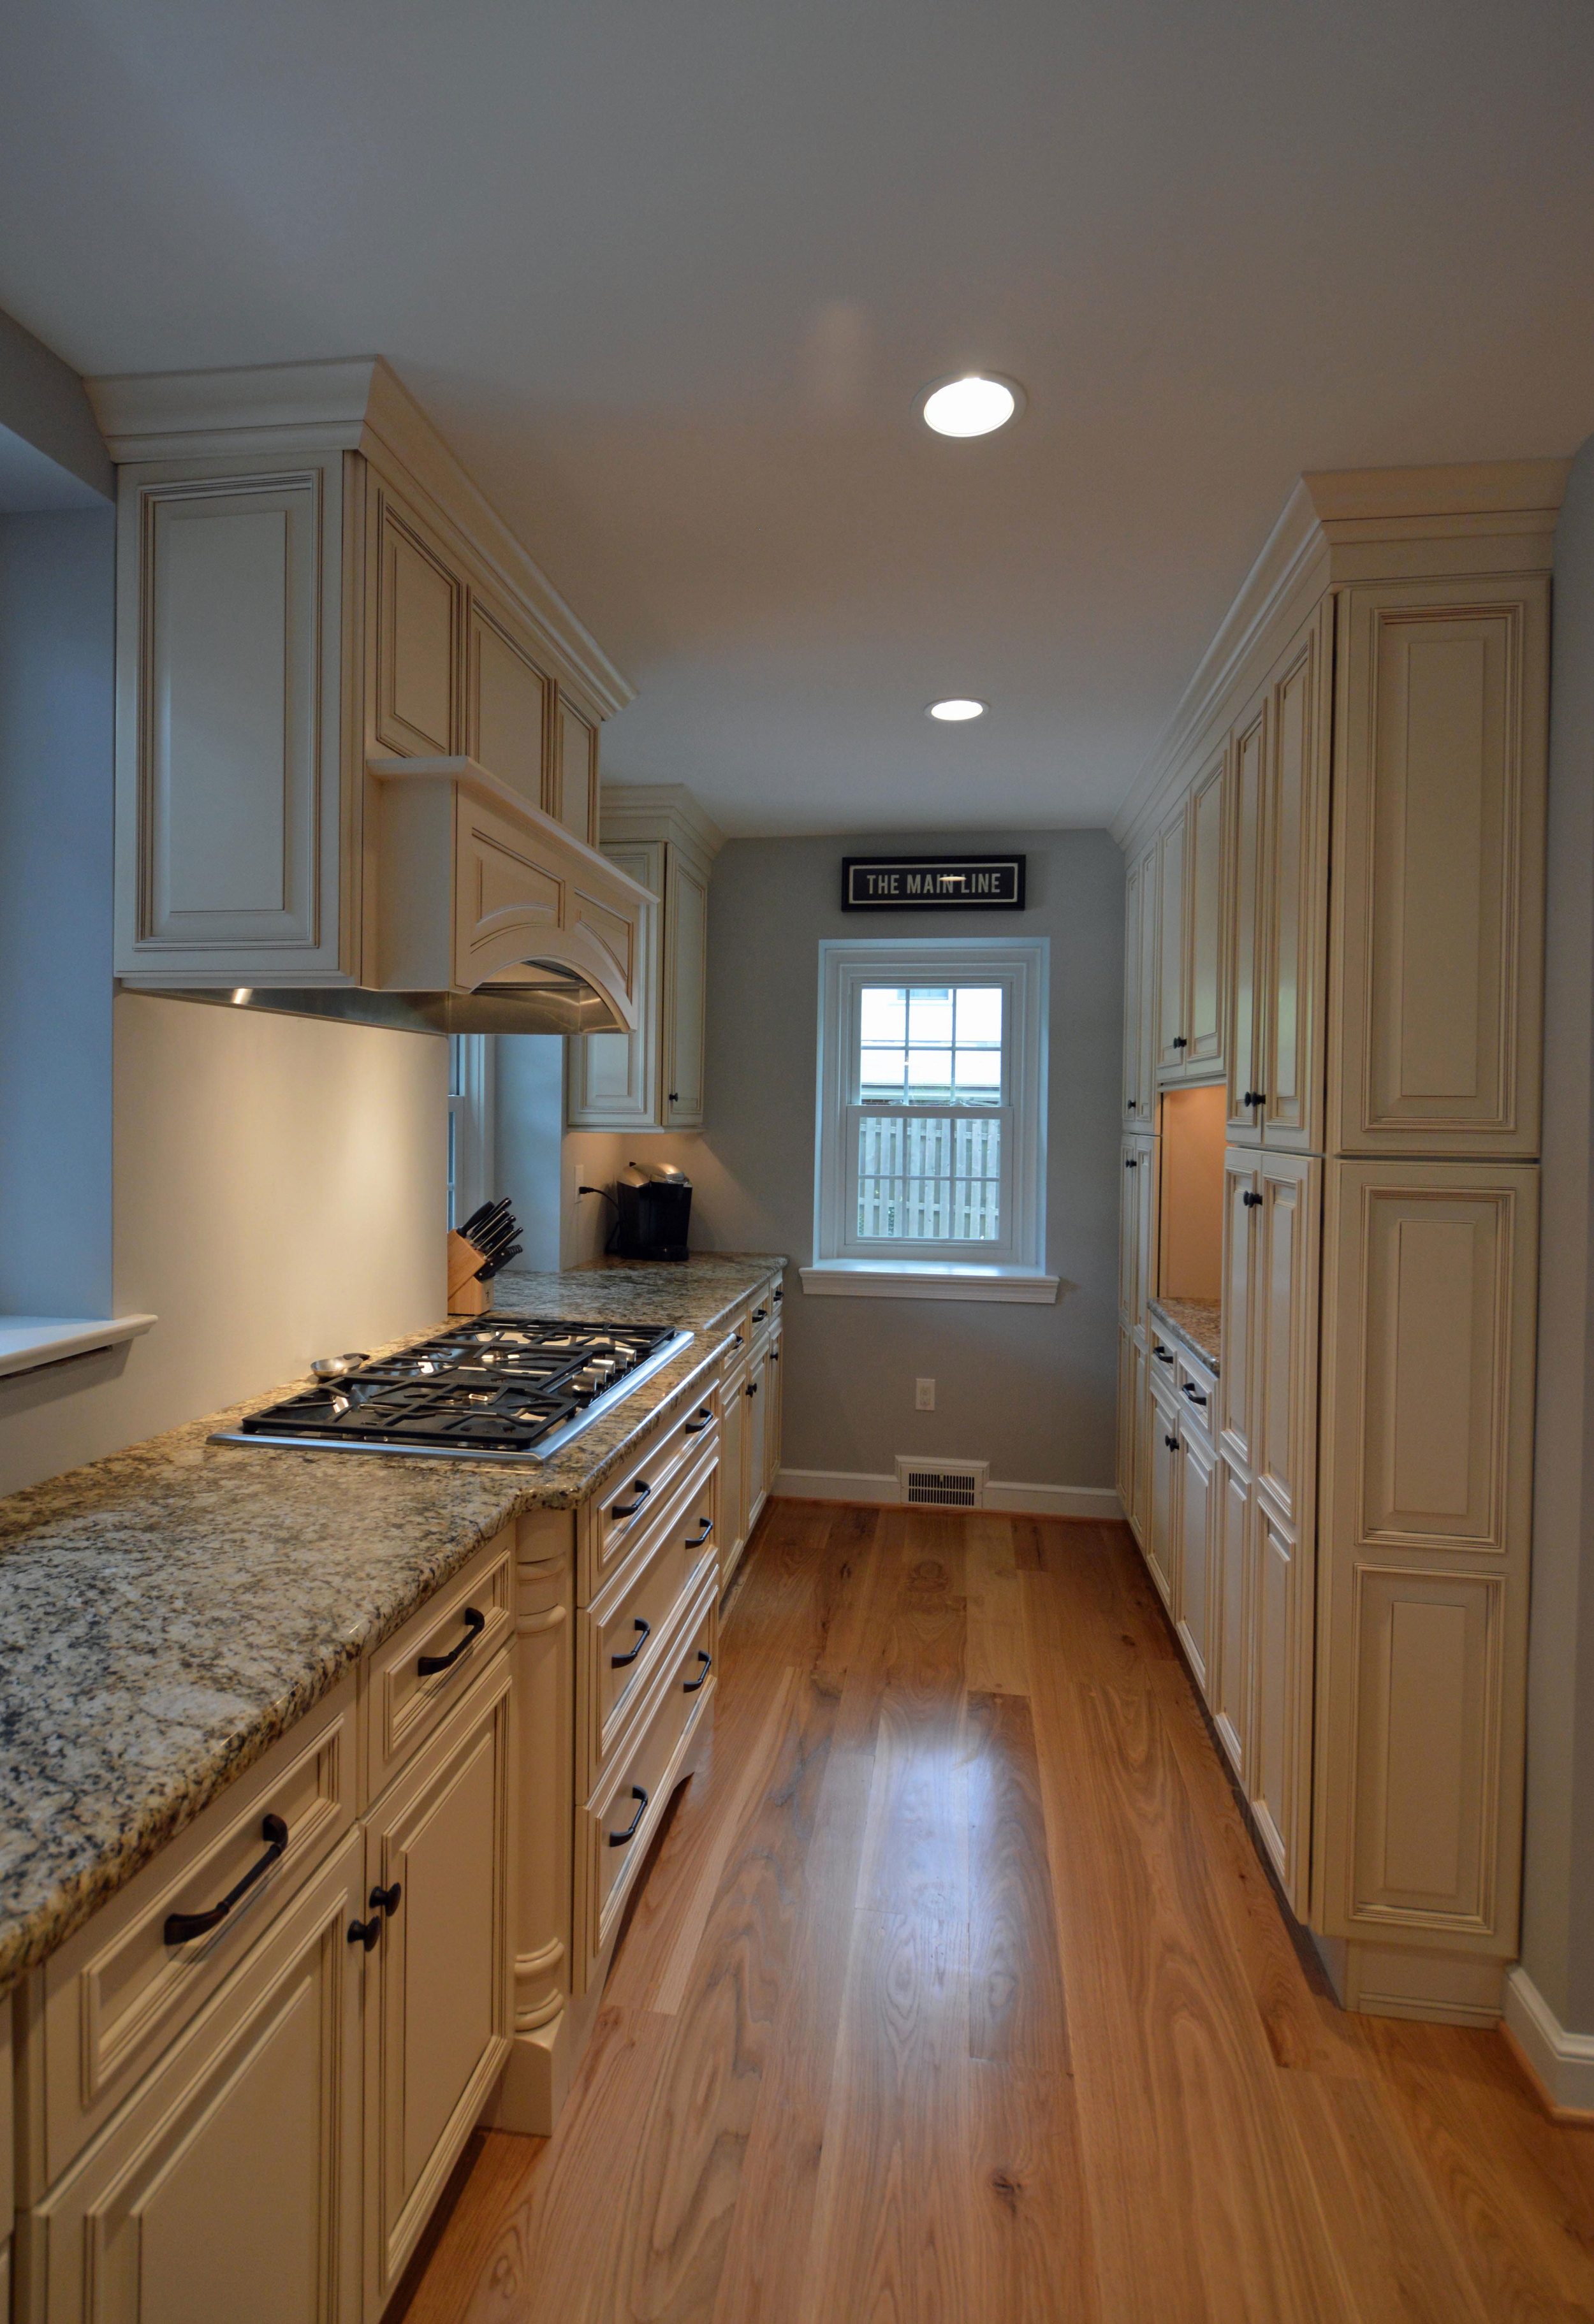 Kitchen remodel in Wayne, PA